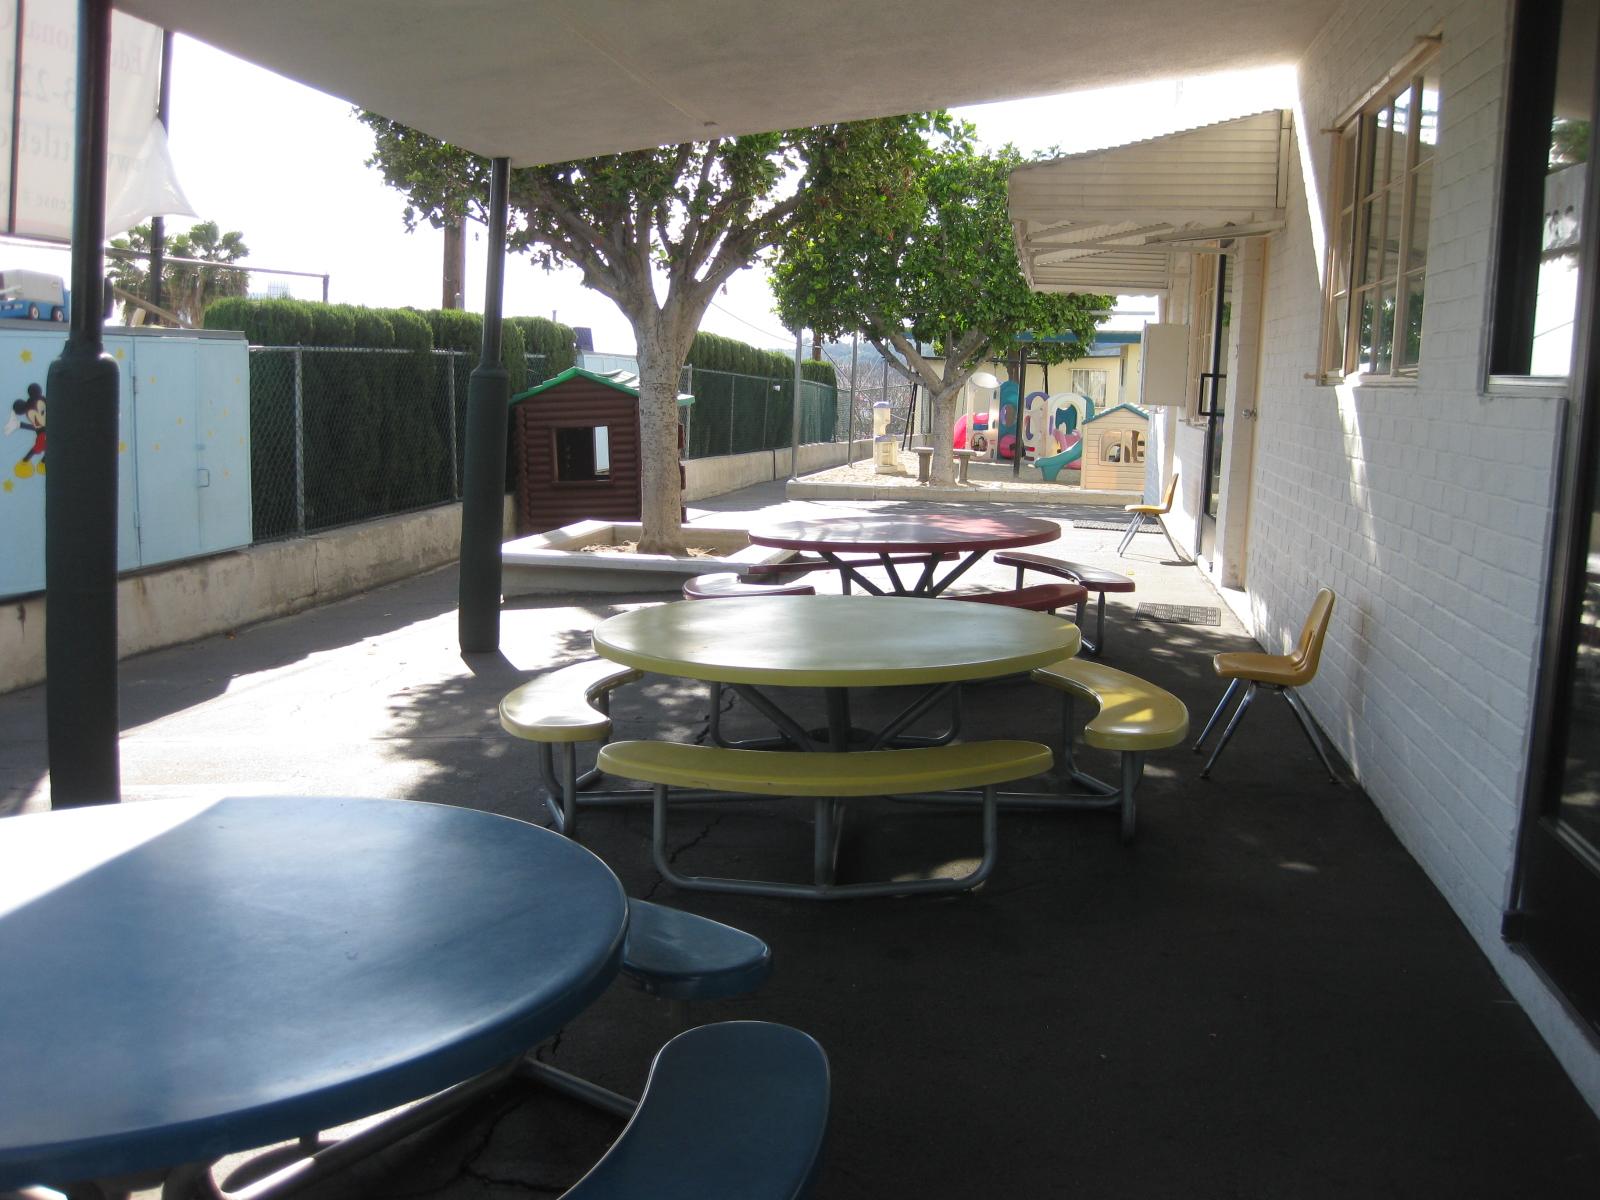 Pre-School Snack Area